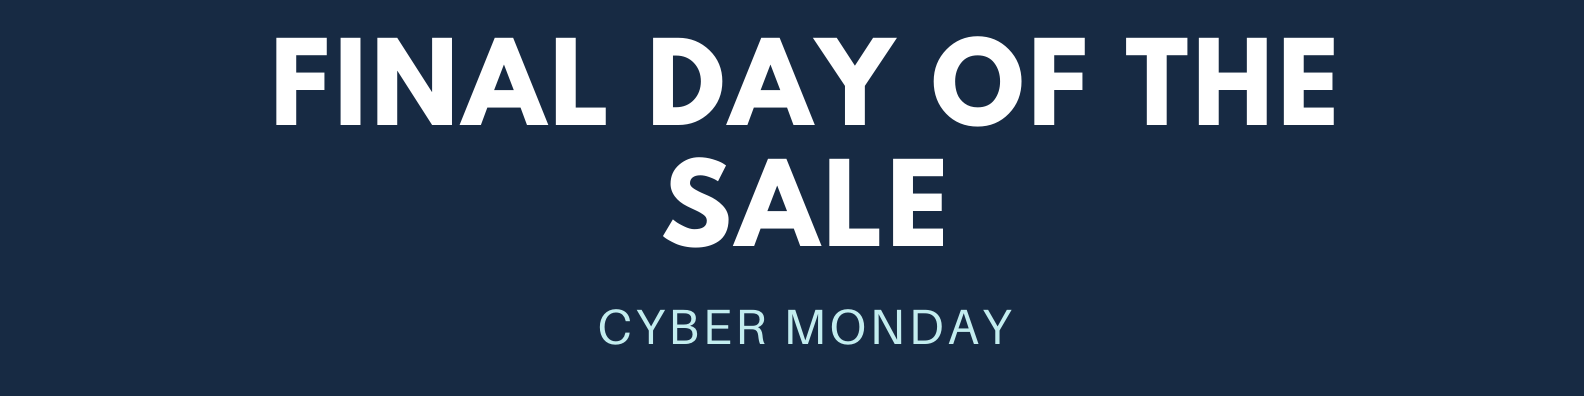 2021 Black Friday Marketing Strategy Cyber Monday